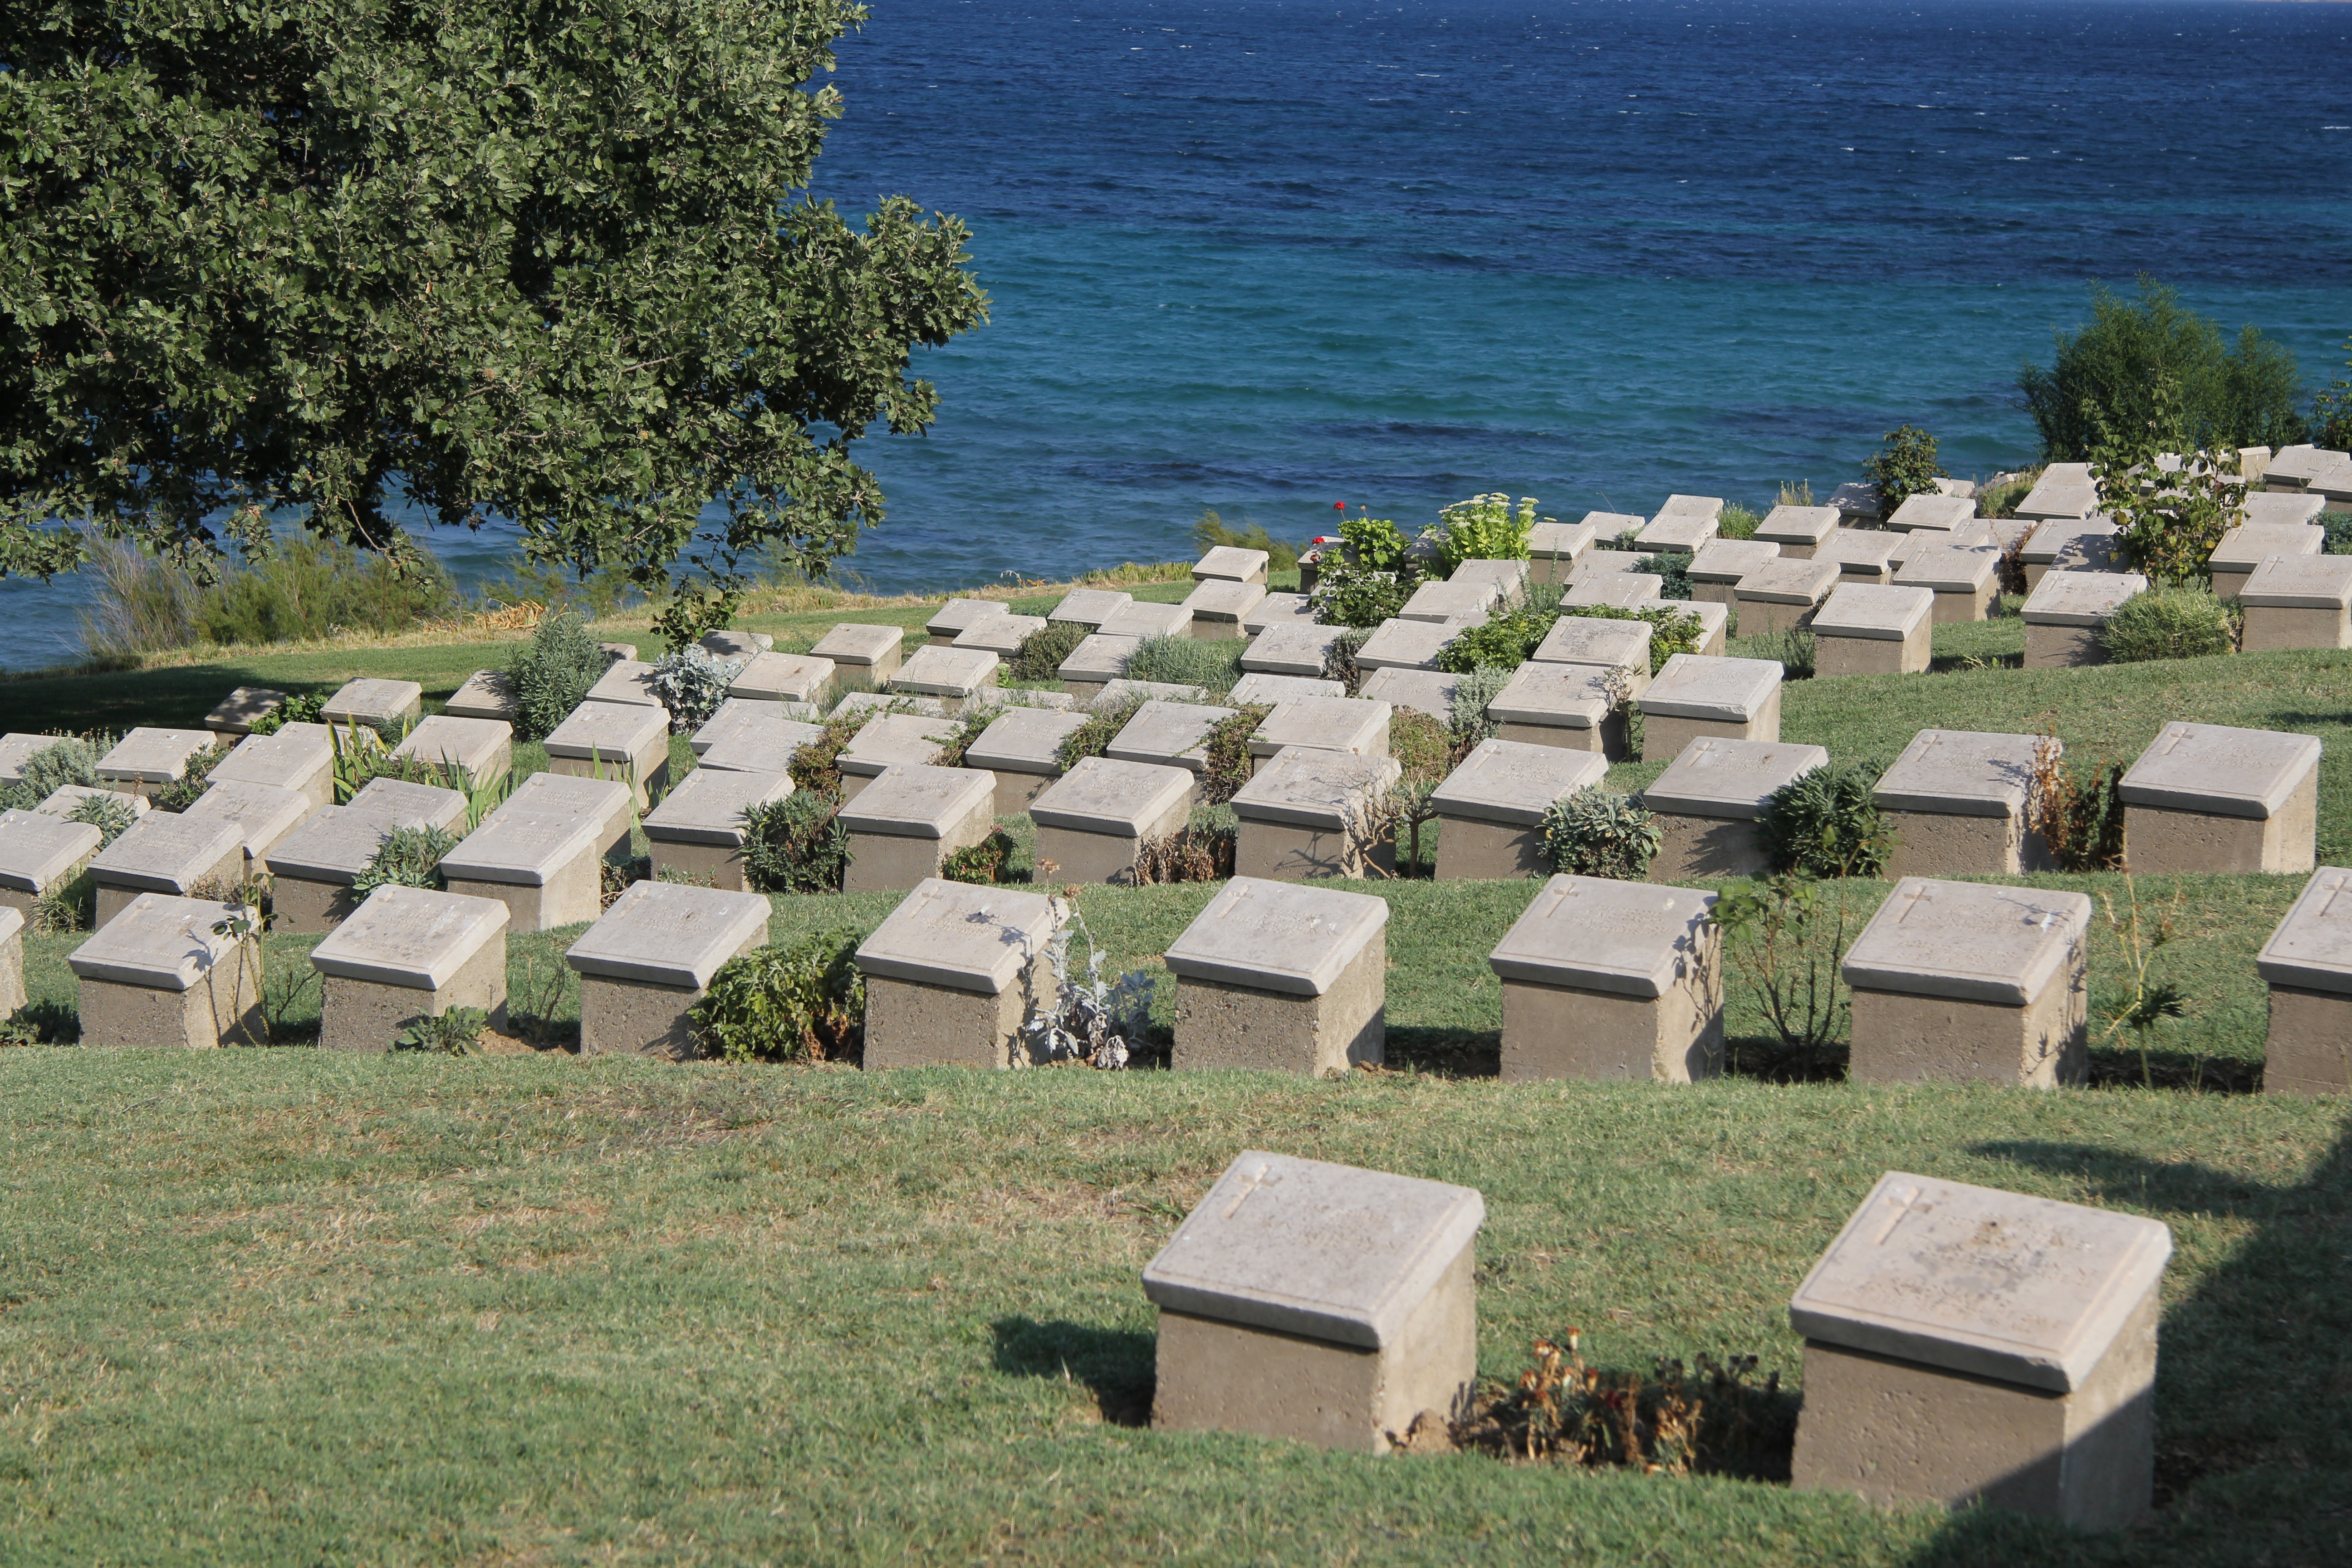 File:Beach Commonwealth Cemetery, Gallipoli, Turkey.jpg - Wikimedia Commons